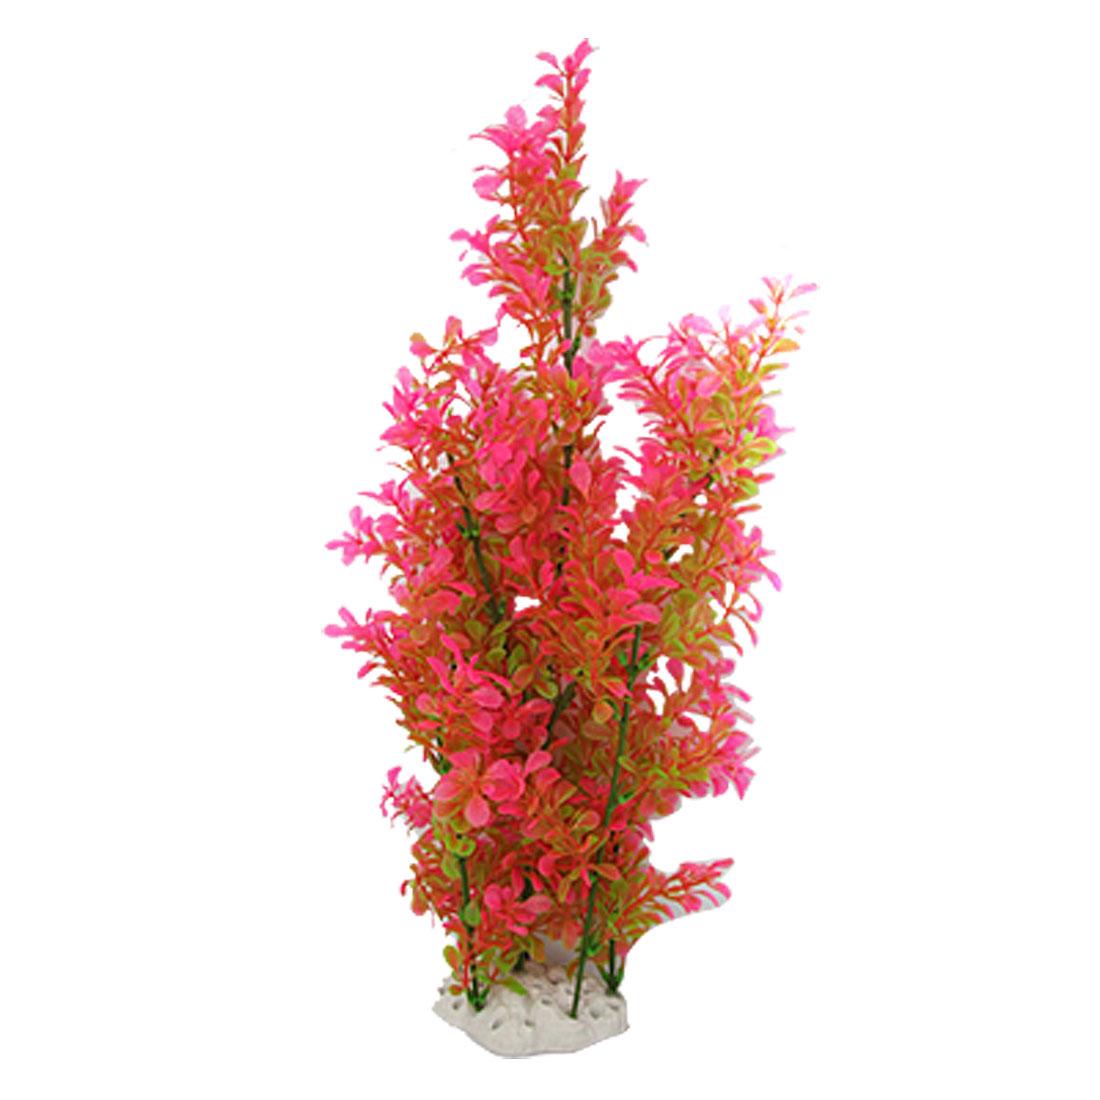 Manmade Hot Pink Green Fish Tank Aquarium Ornament w Ceramic Base